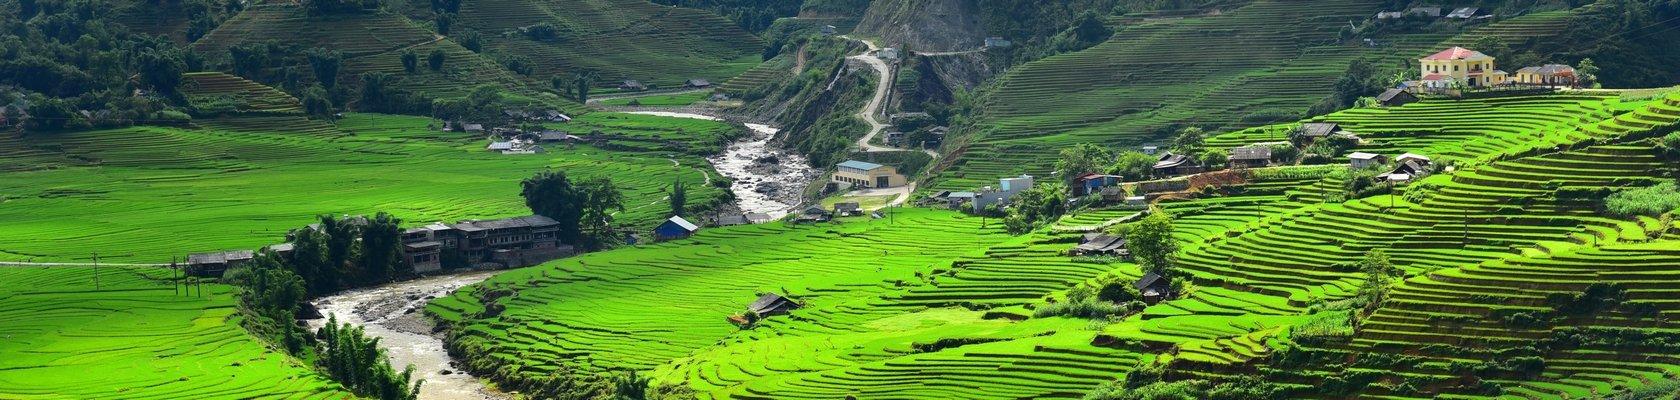 Prachtig Laos